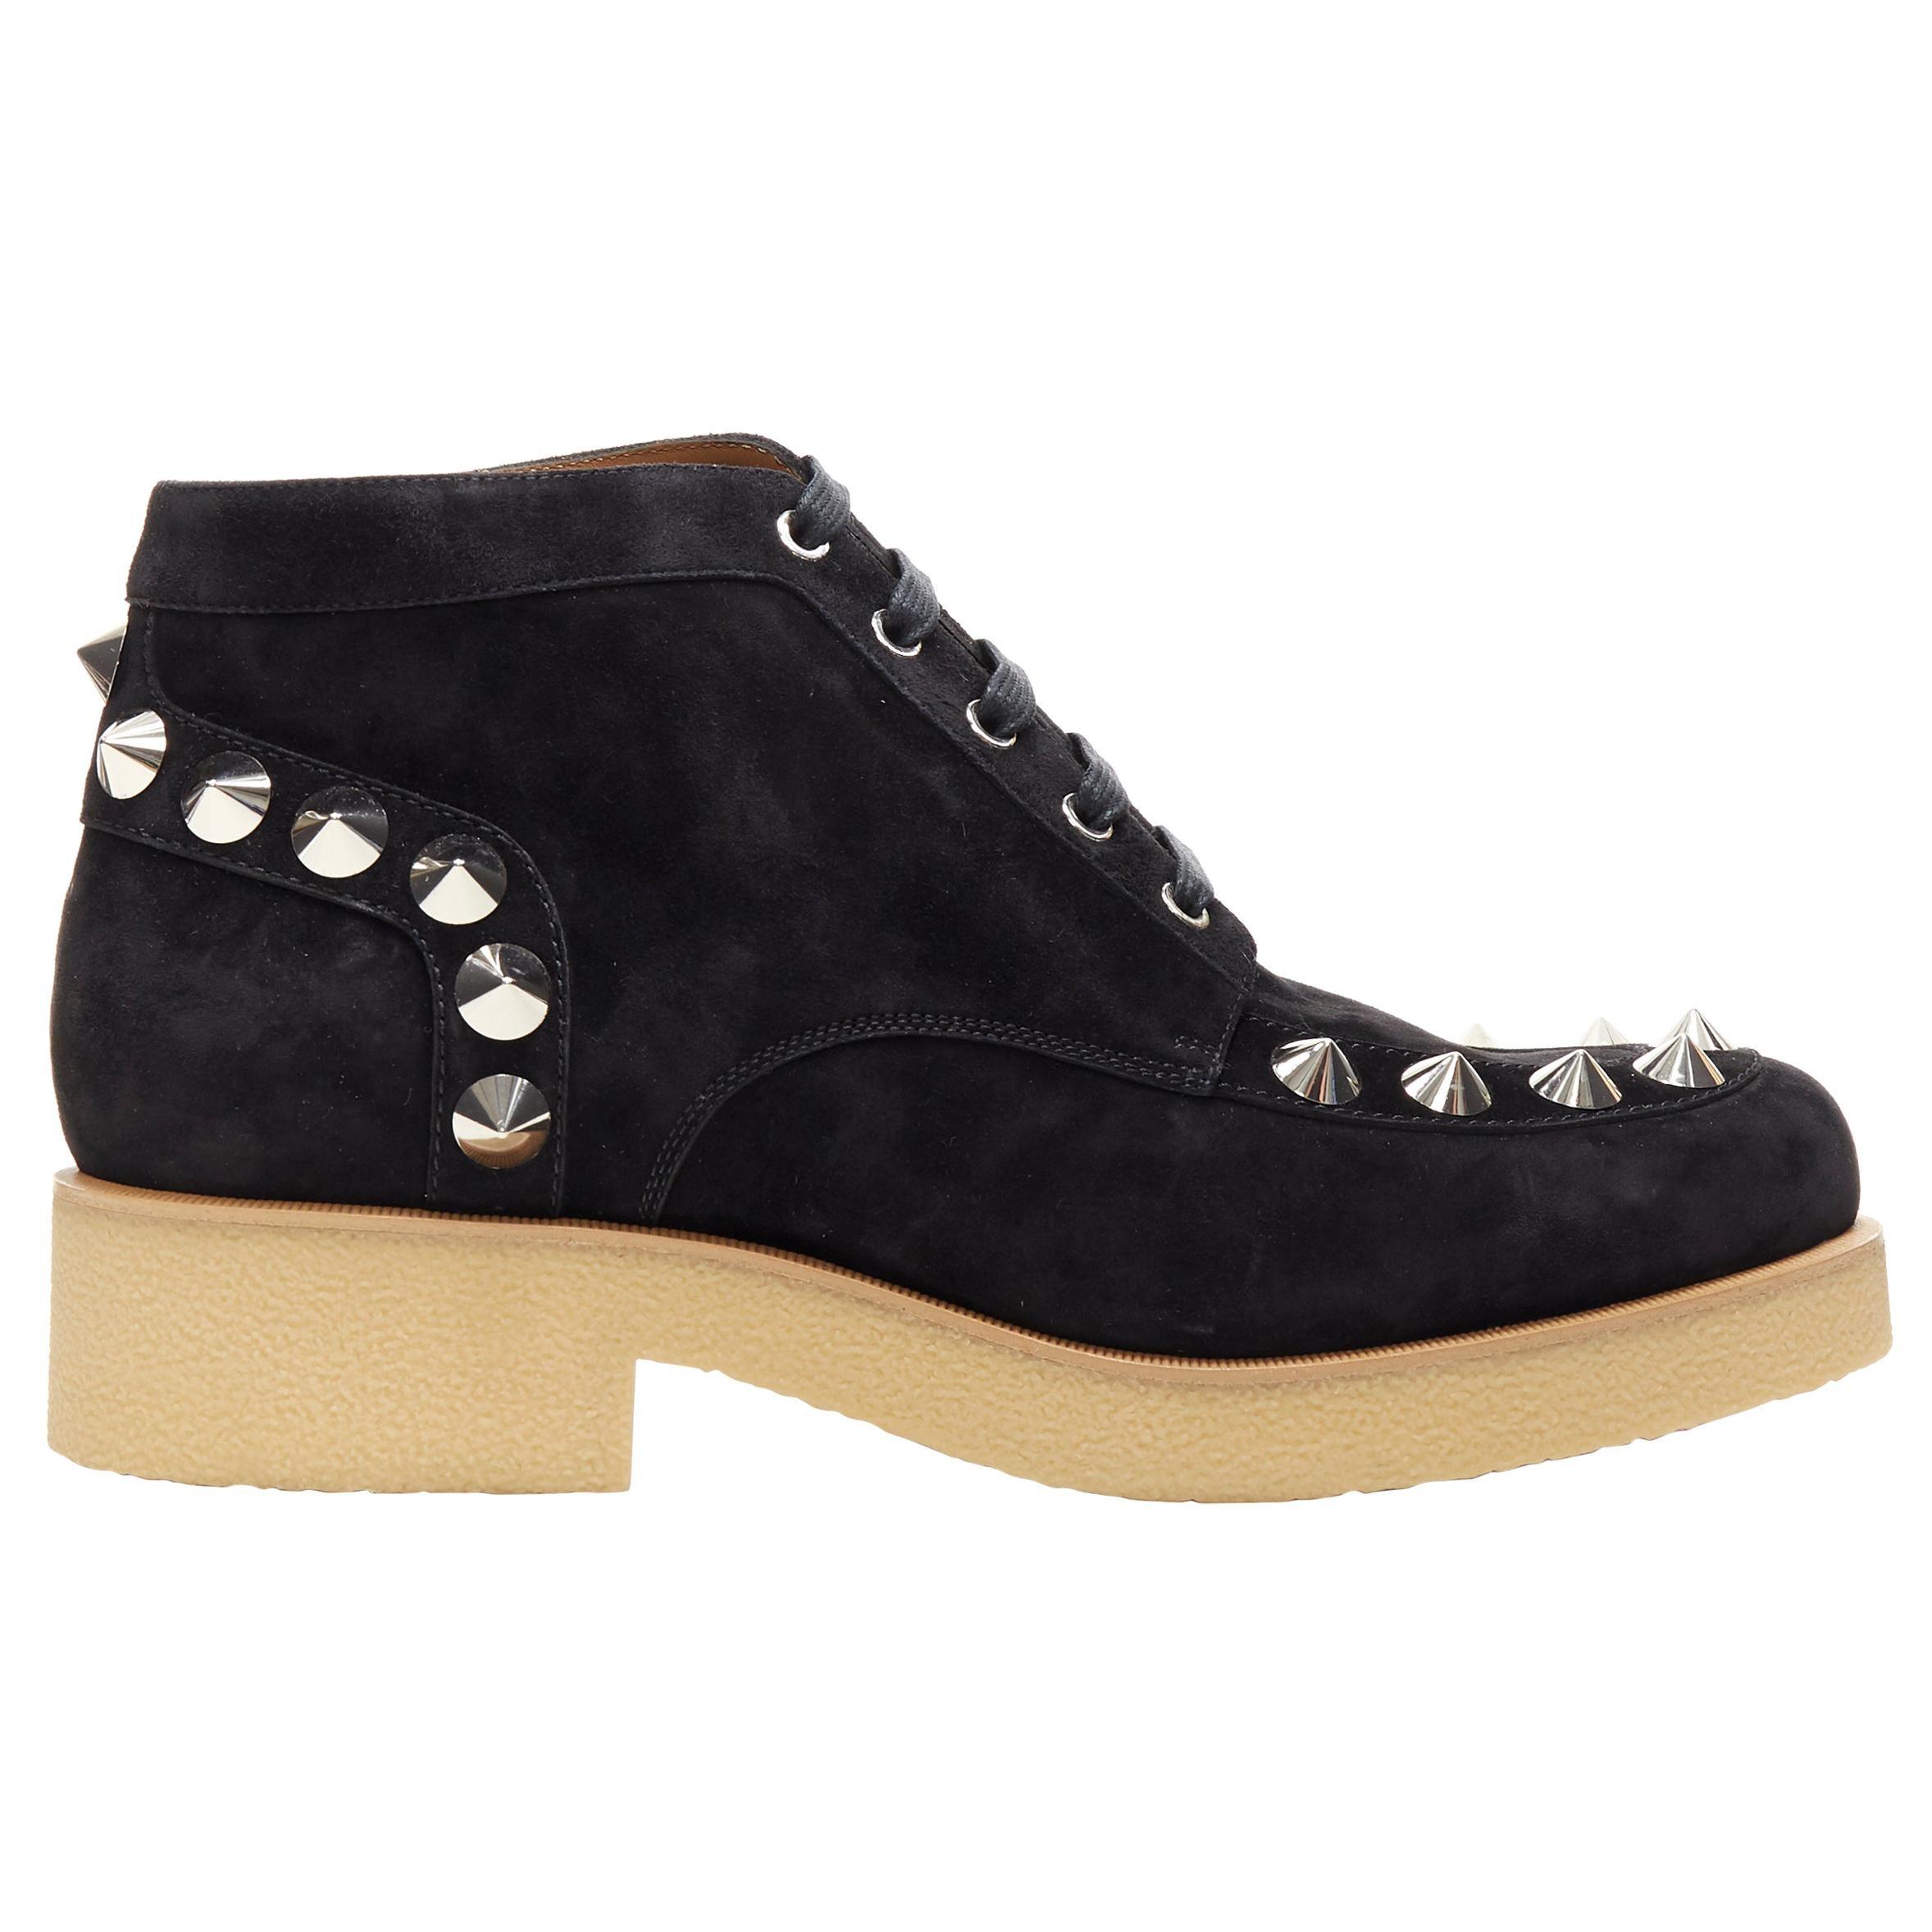 new CHRISTIAN LOUBOUTIN Yannick Flat black suede spike stud creeper boots EU42